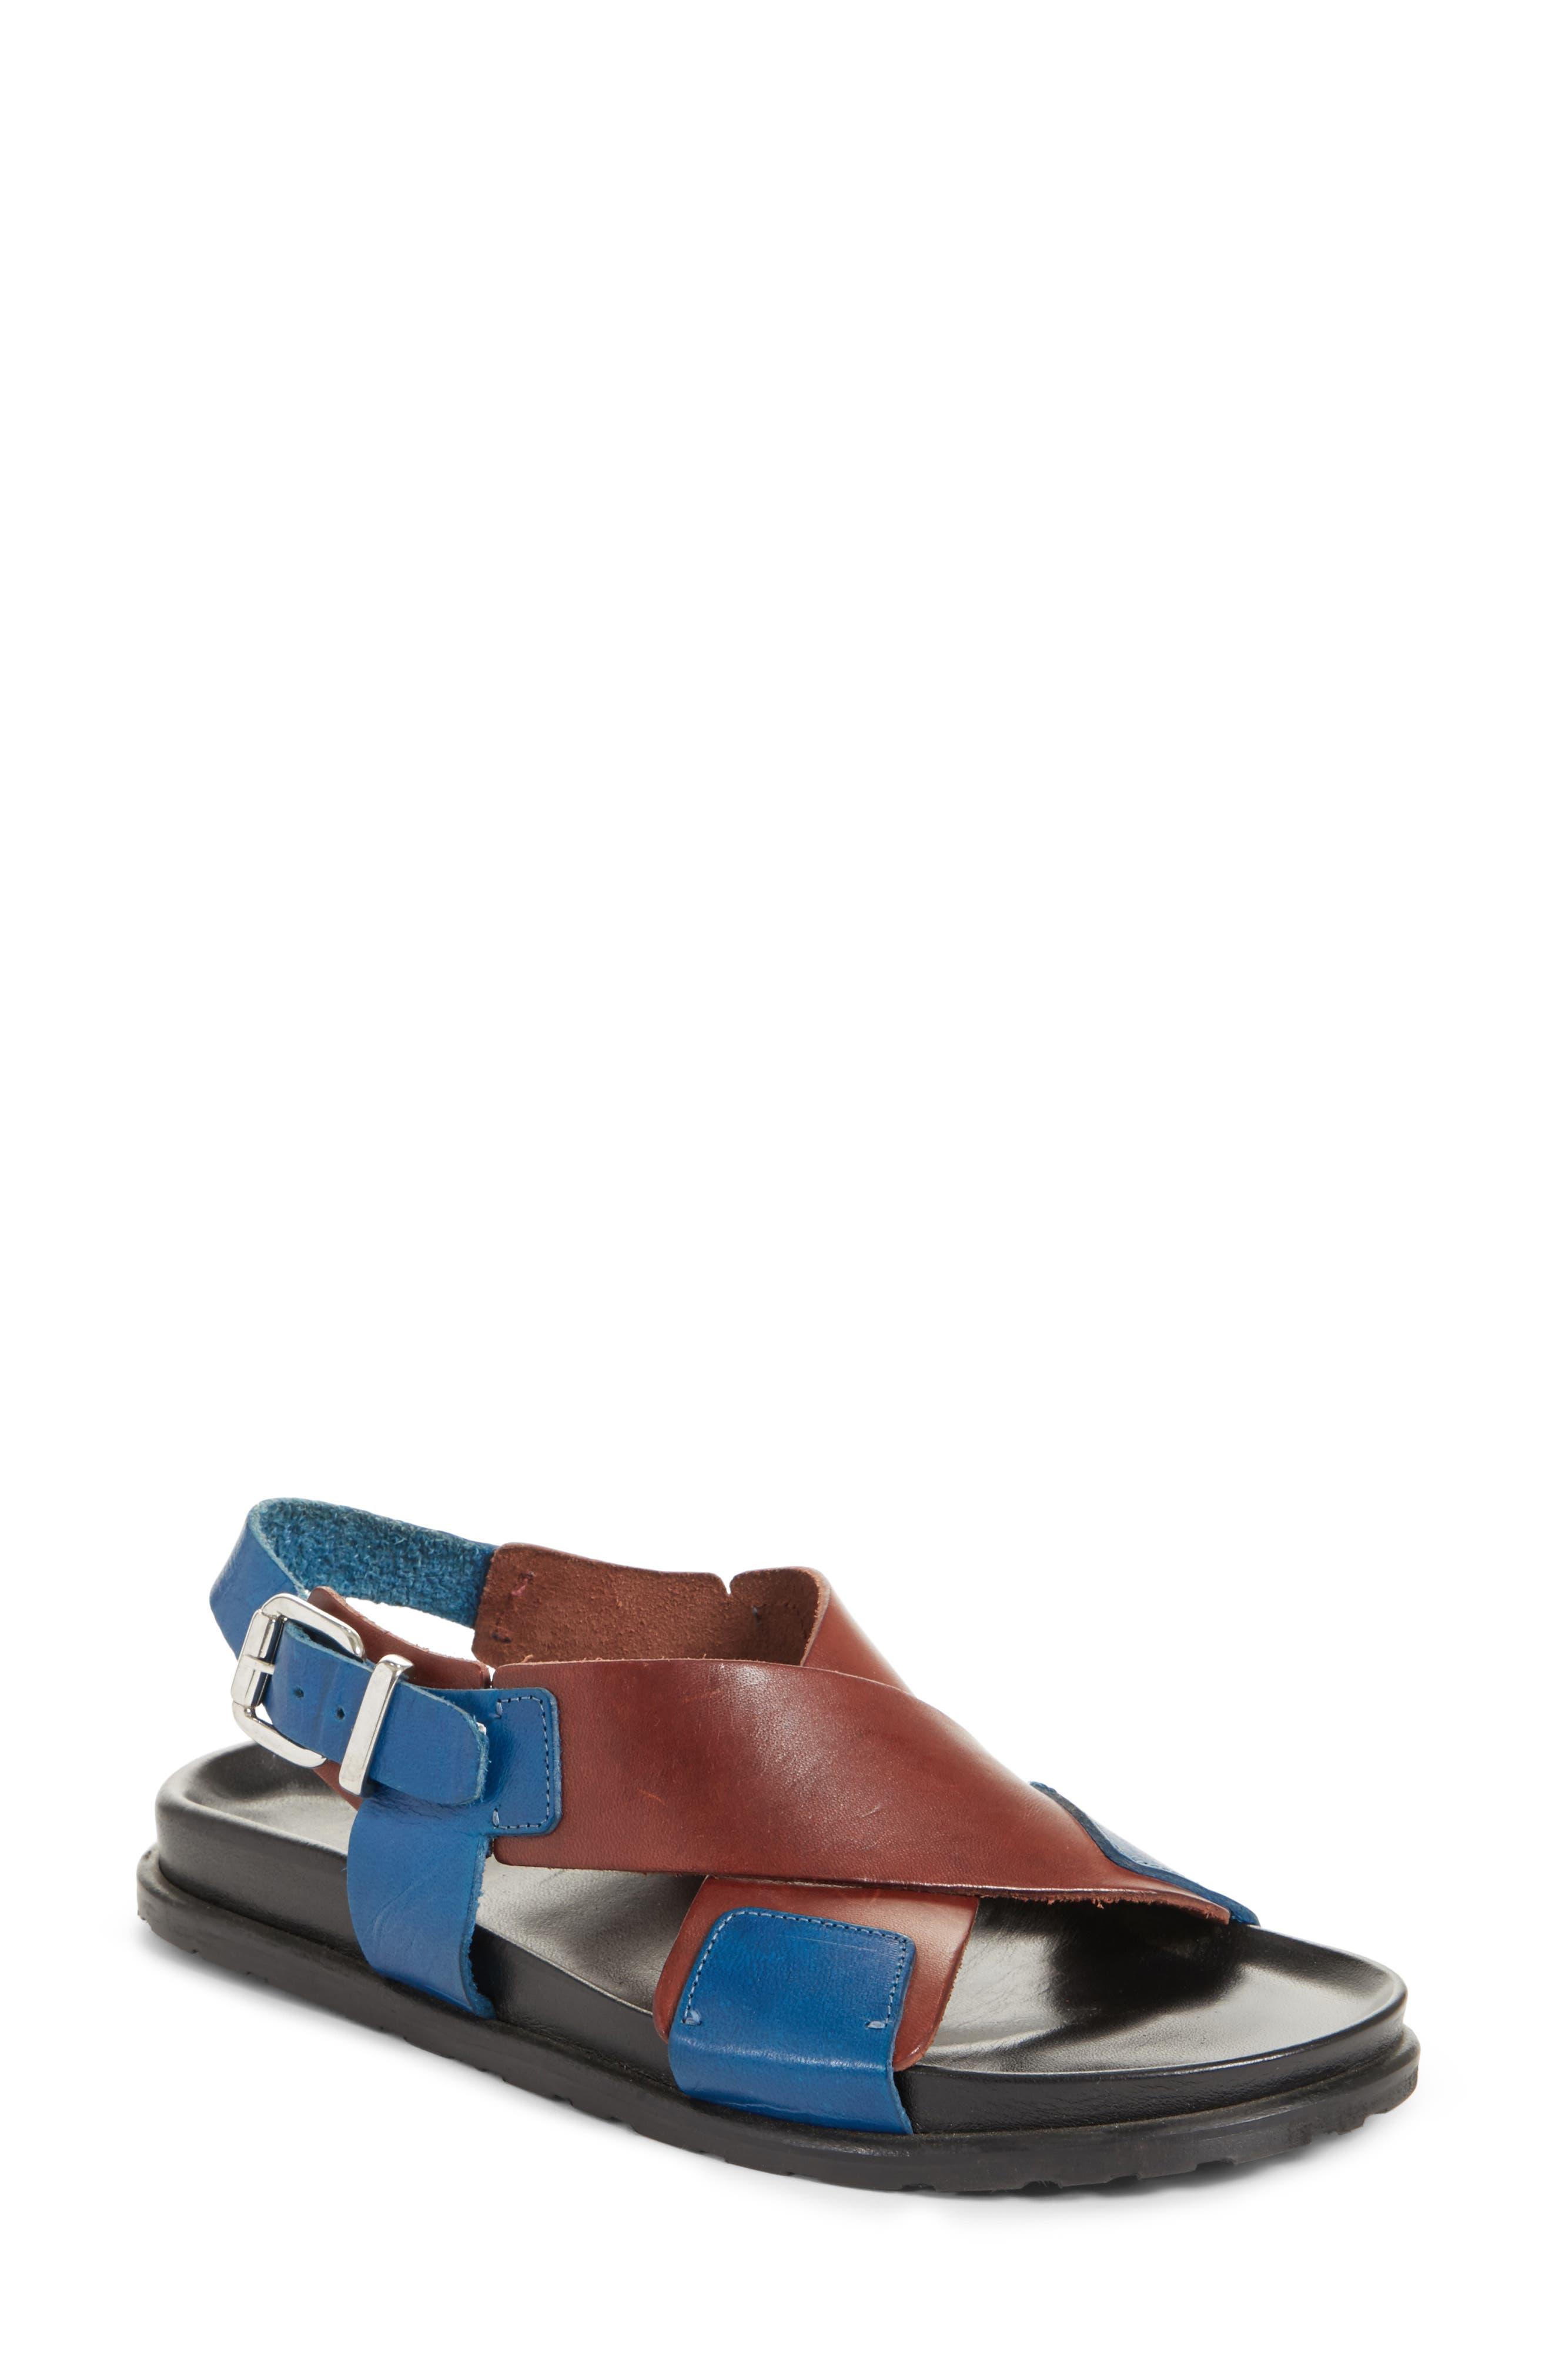 Bicolor Strappy Sandal,                         Main,                         color, 200